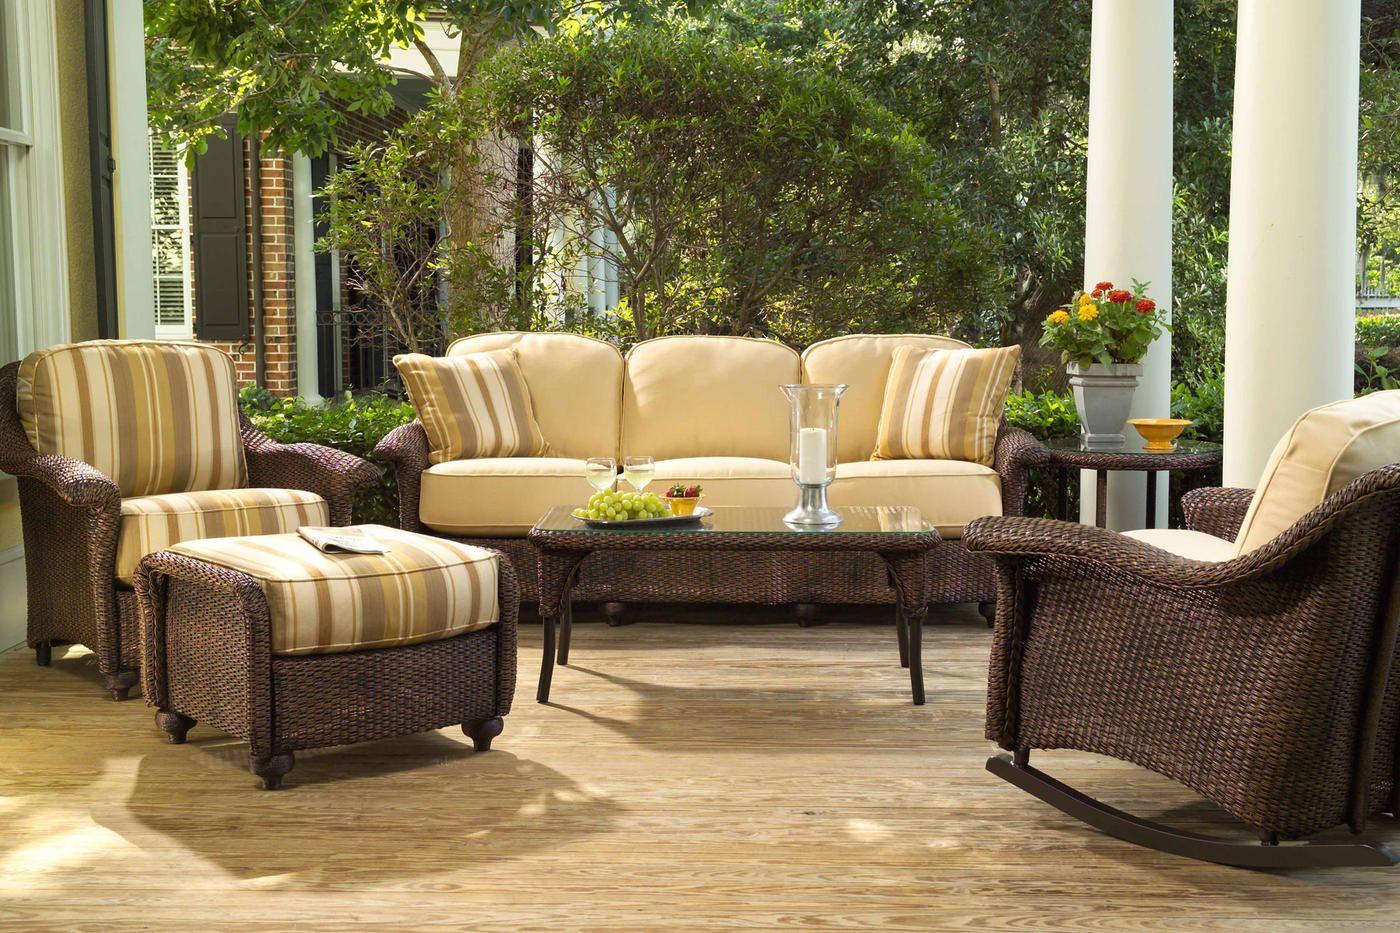 All Weather Wicker Outdoor Furniture Lloyd Flanders Summer